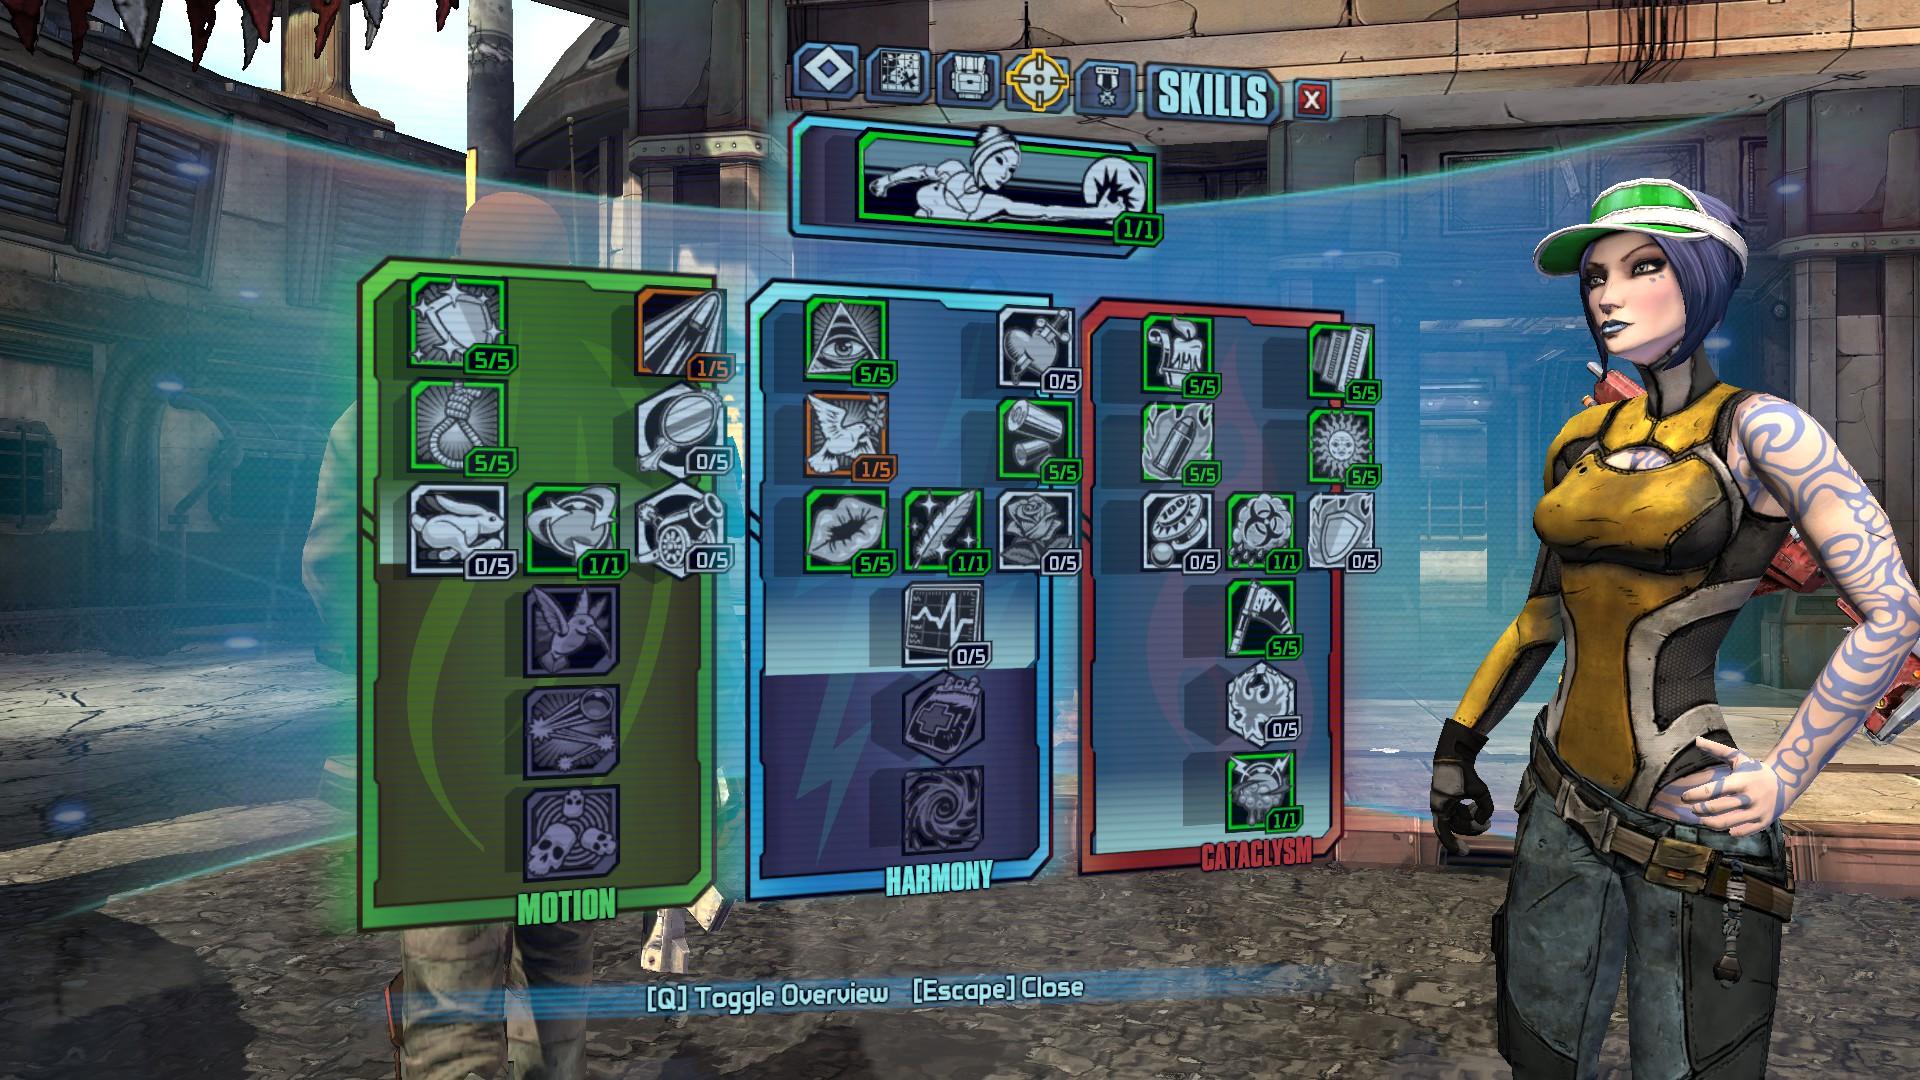 Borderlands 2 Best Commando Skill Tree Setup Lvl 61 - Imagez co